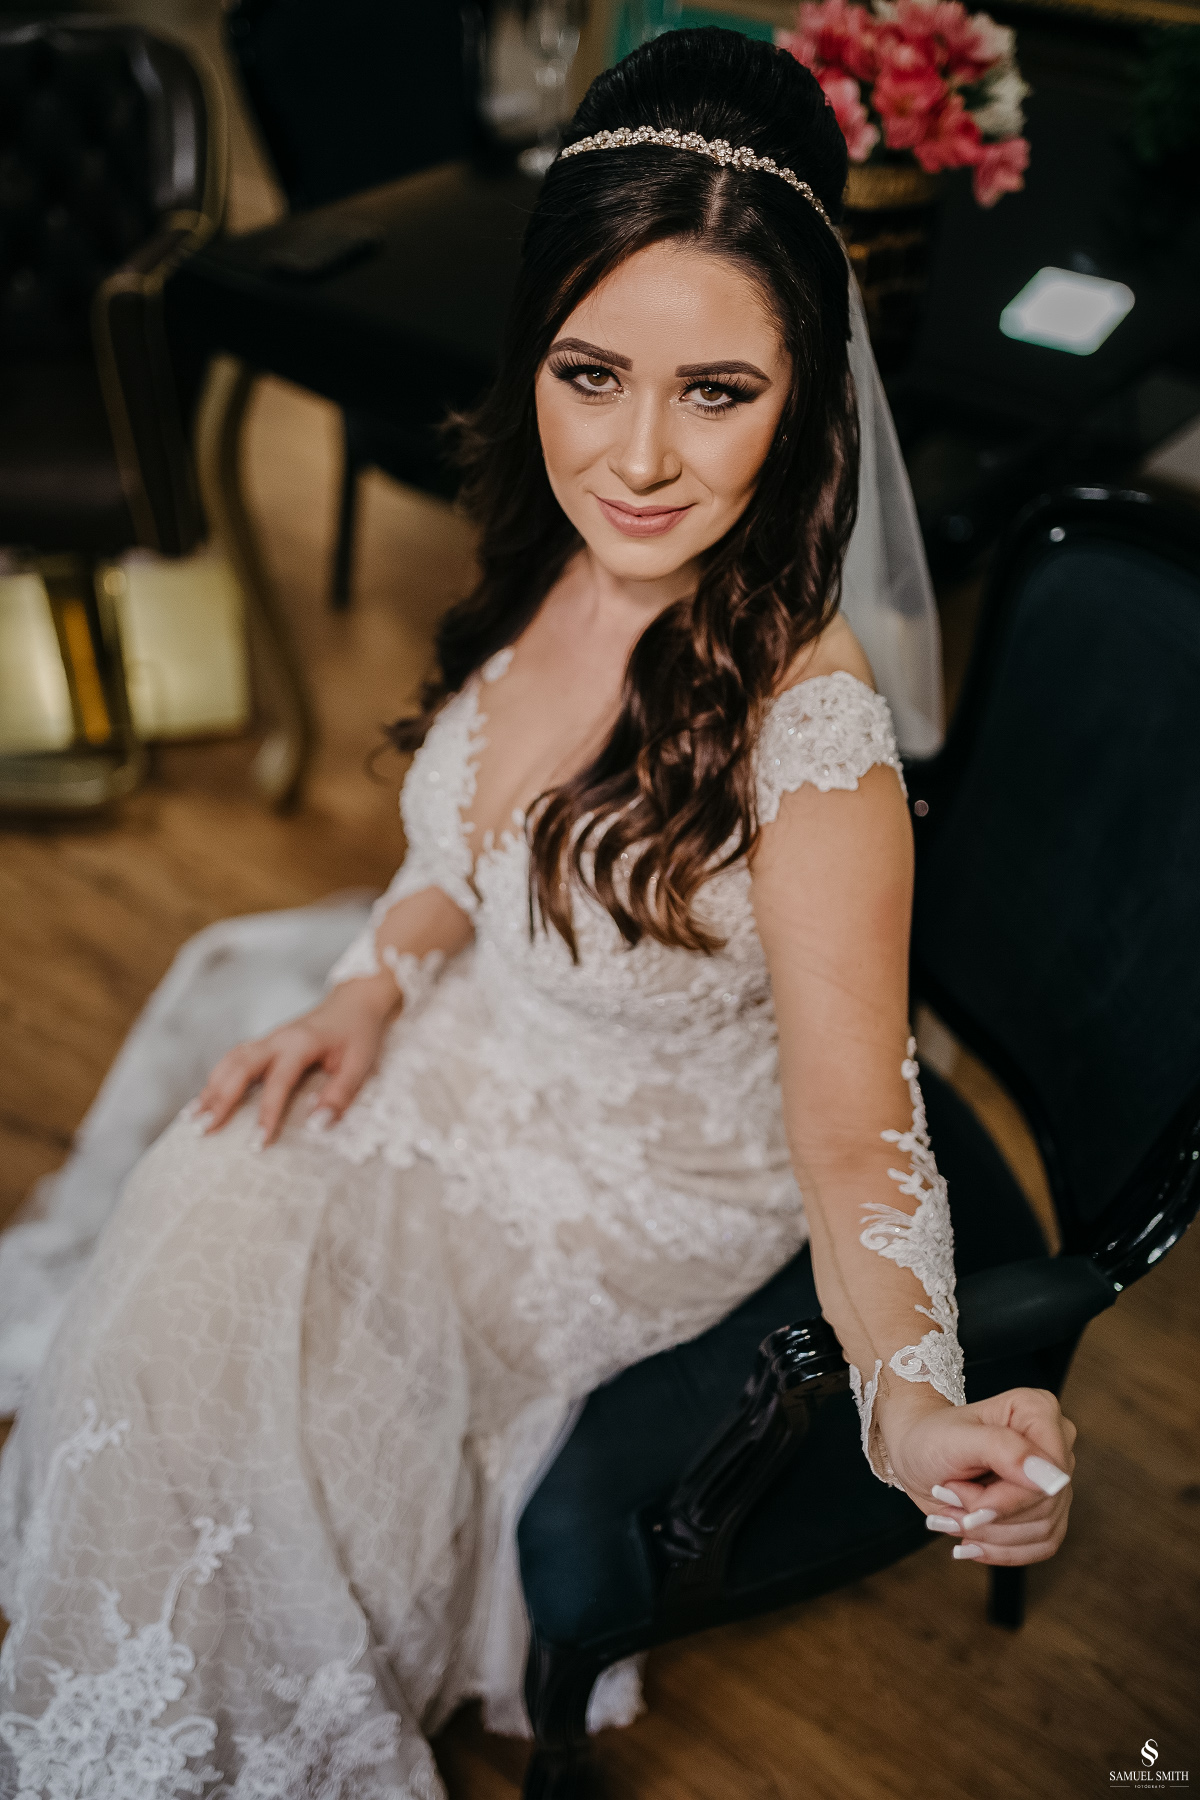 casamento militar terraço cacupe florianópolis sc floripa wedding fotógrafo samuel smith (44)